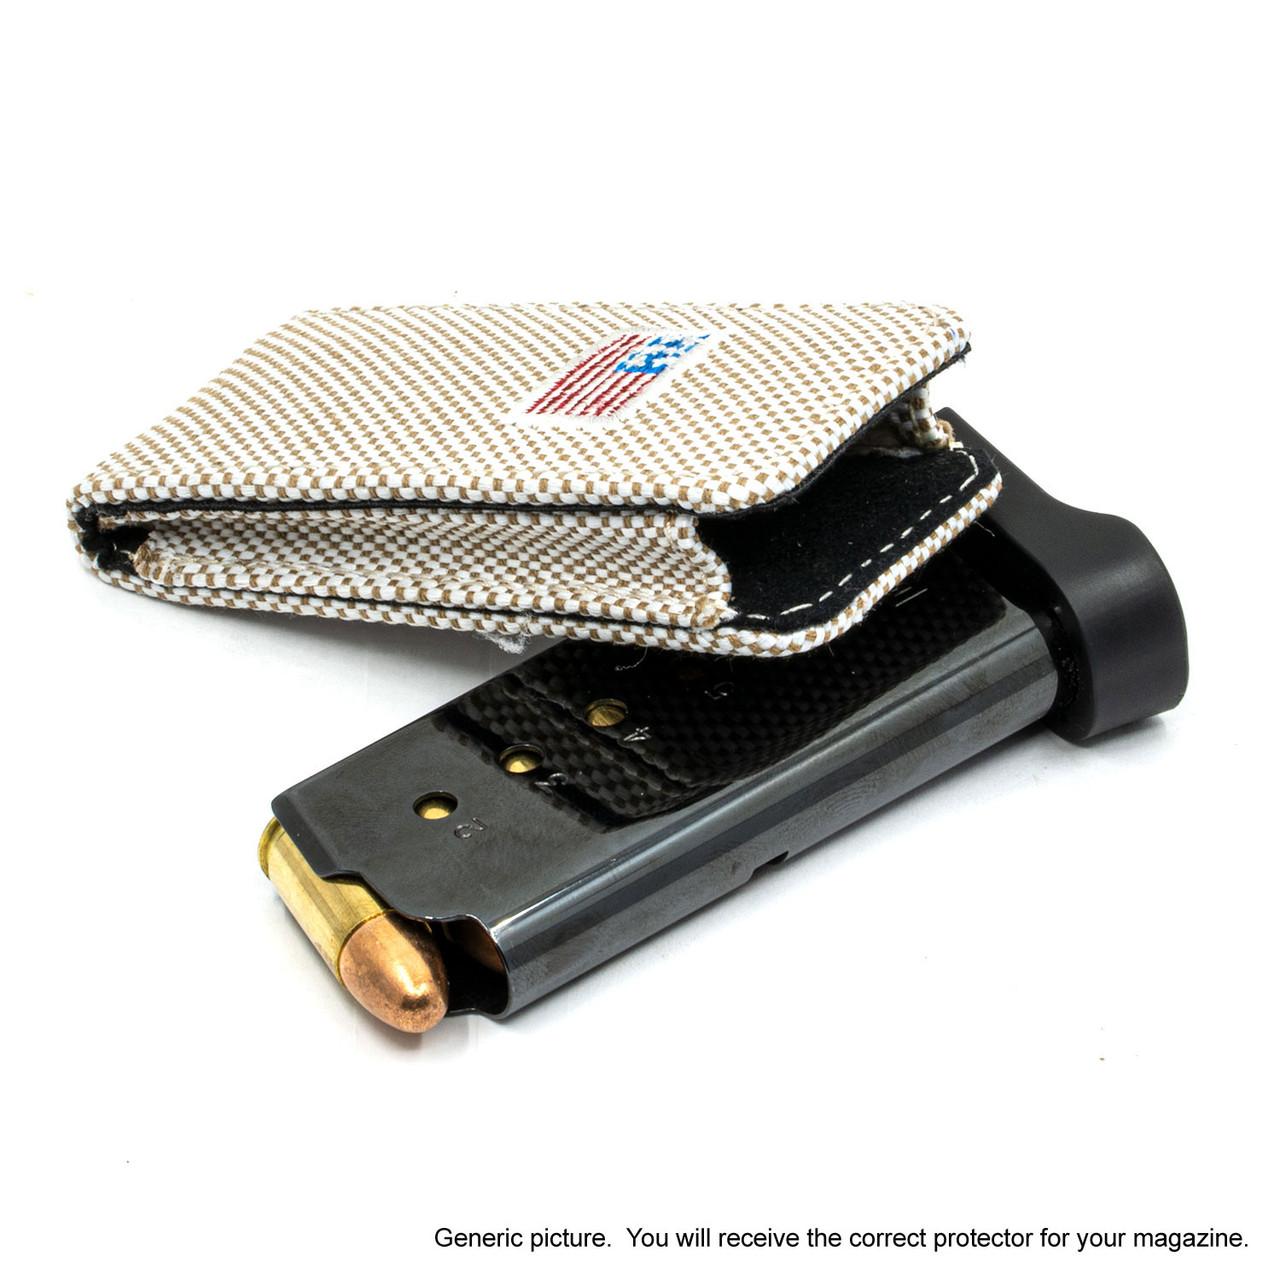 Taurus GX4 Holsters Tan Canvas Flag Magazine Pocket Protector